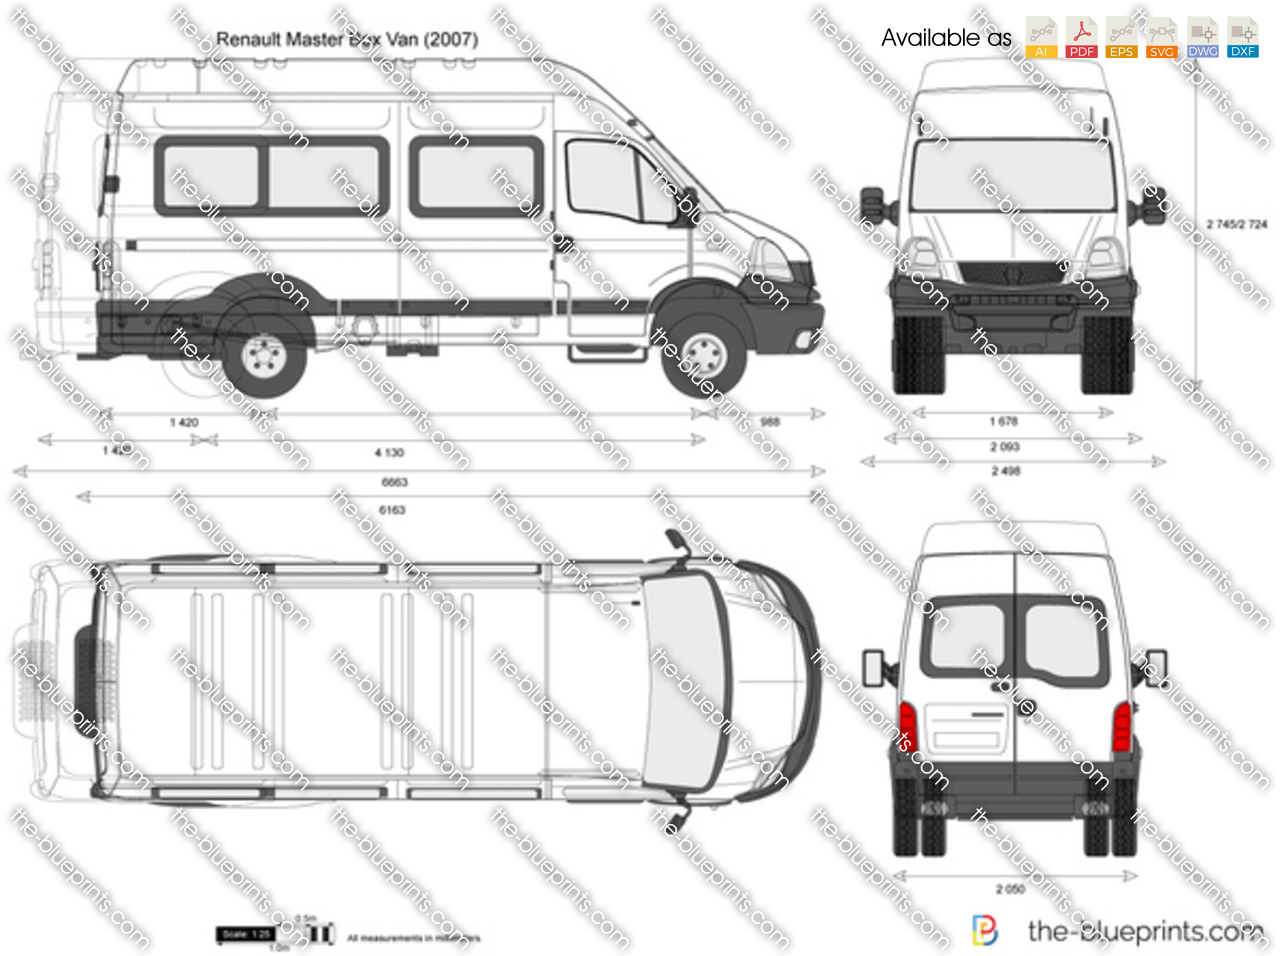 Renault Master Box Van 2005